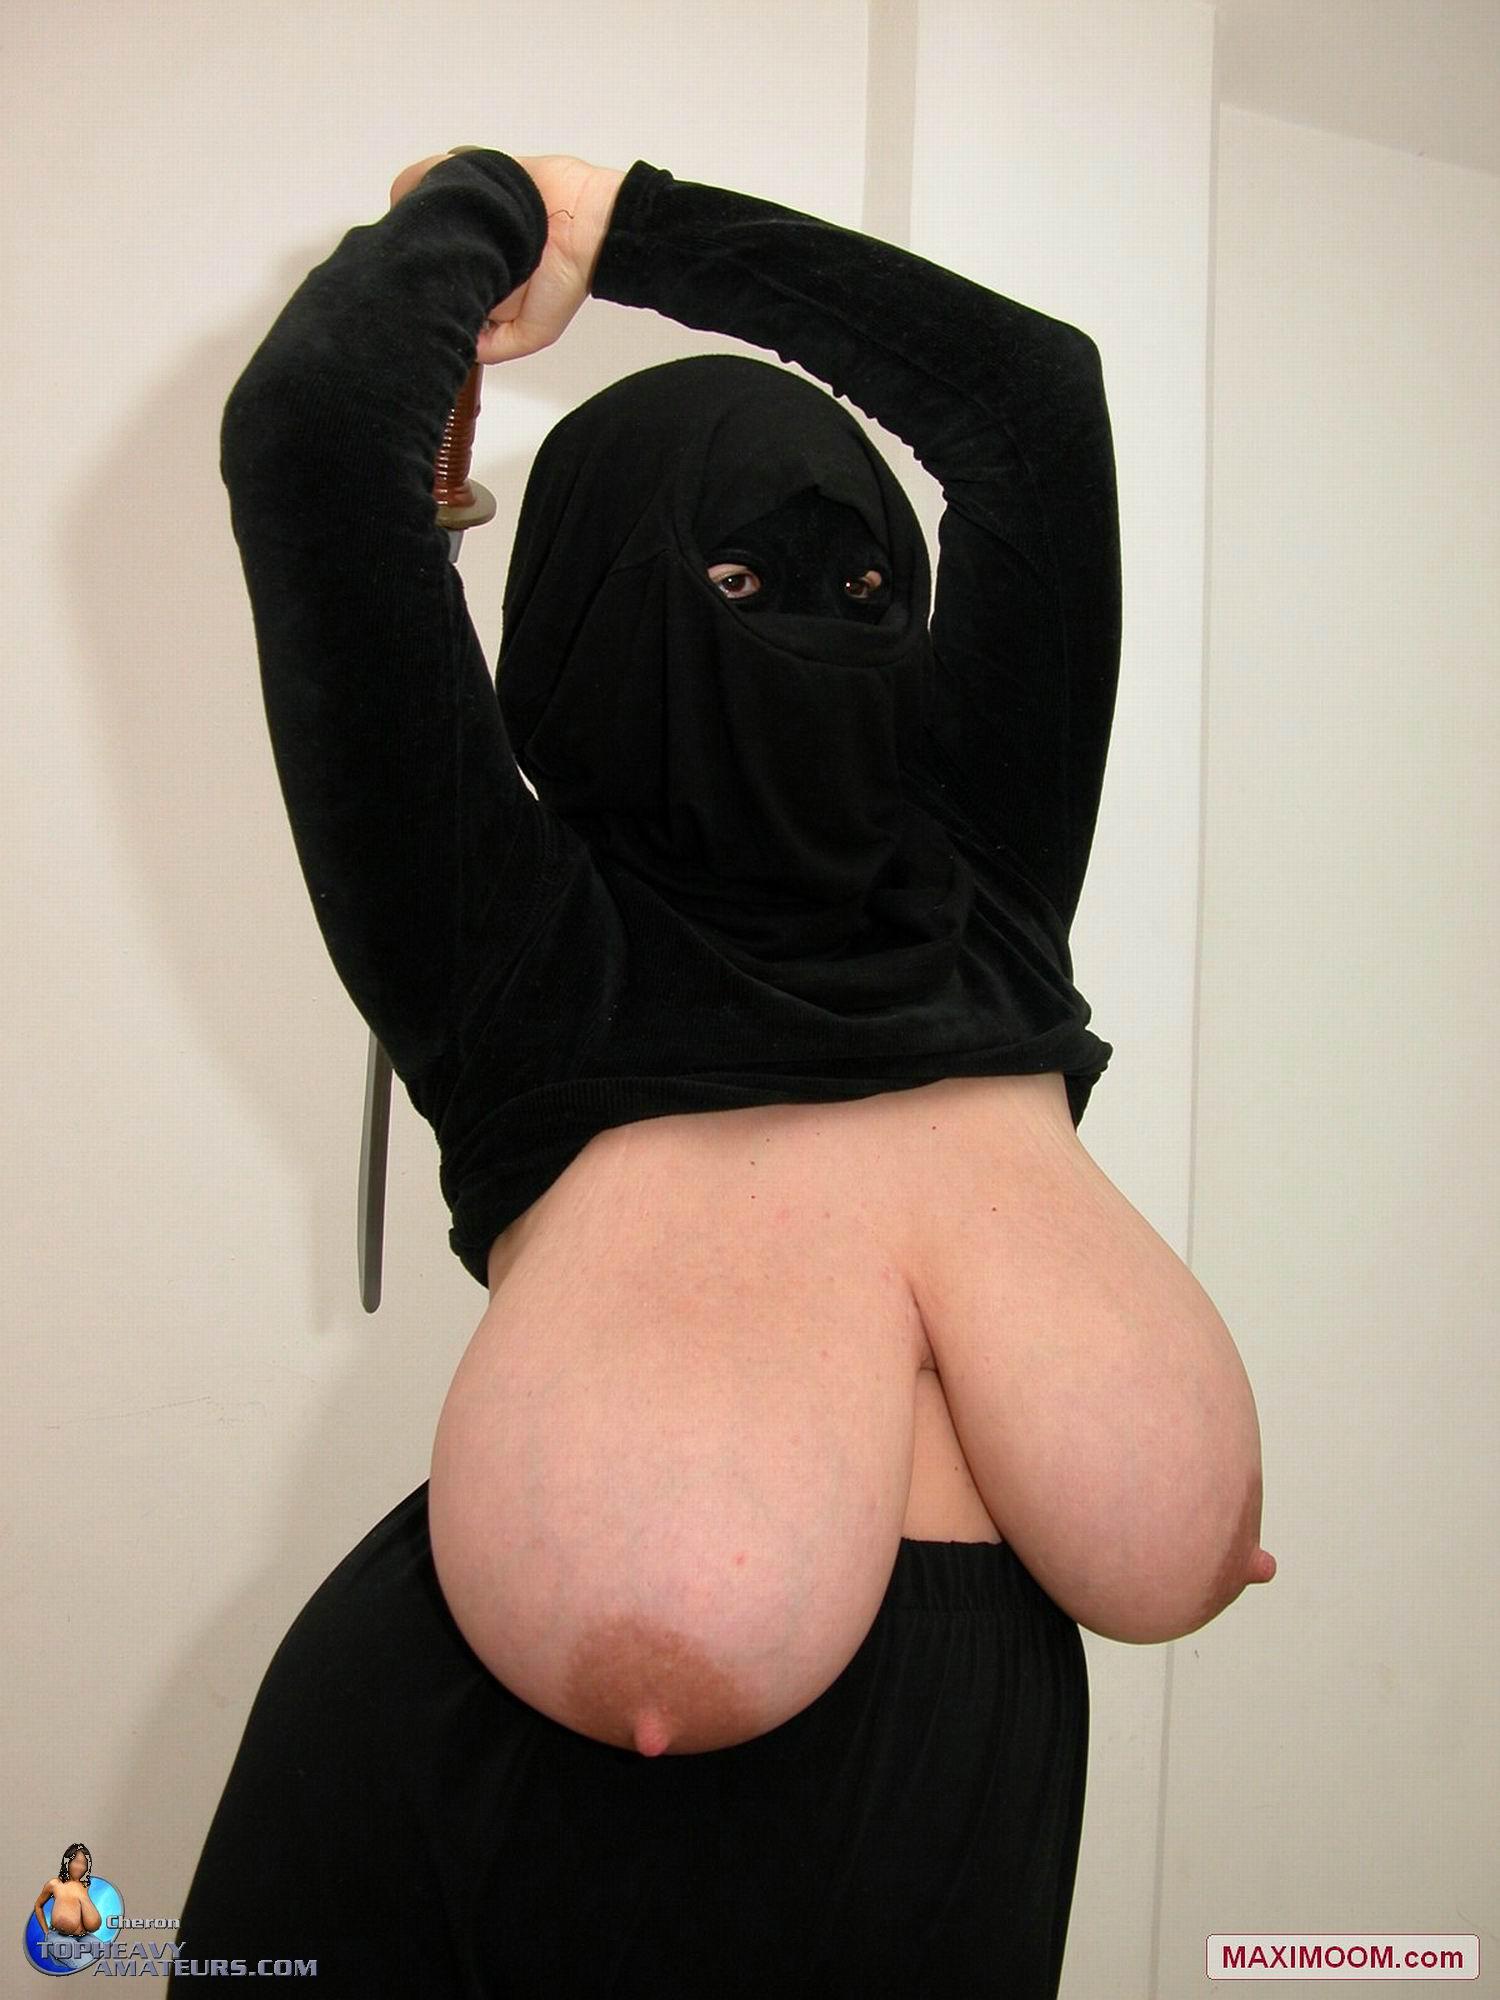 Hot busty gal amateur live cam video 3